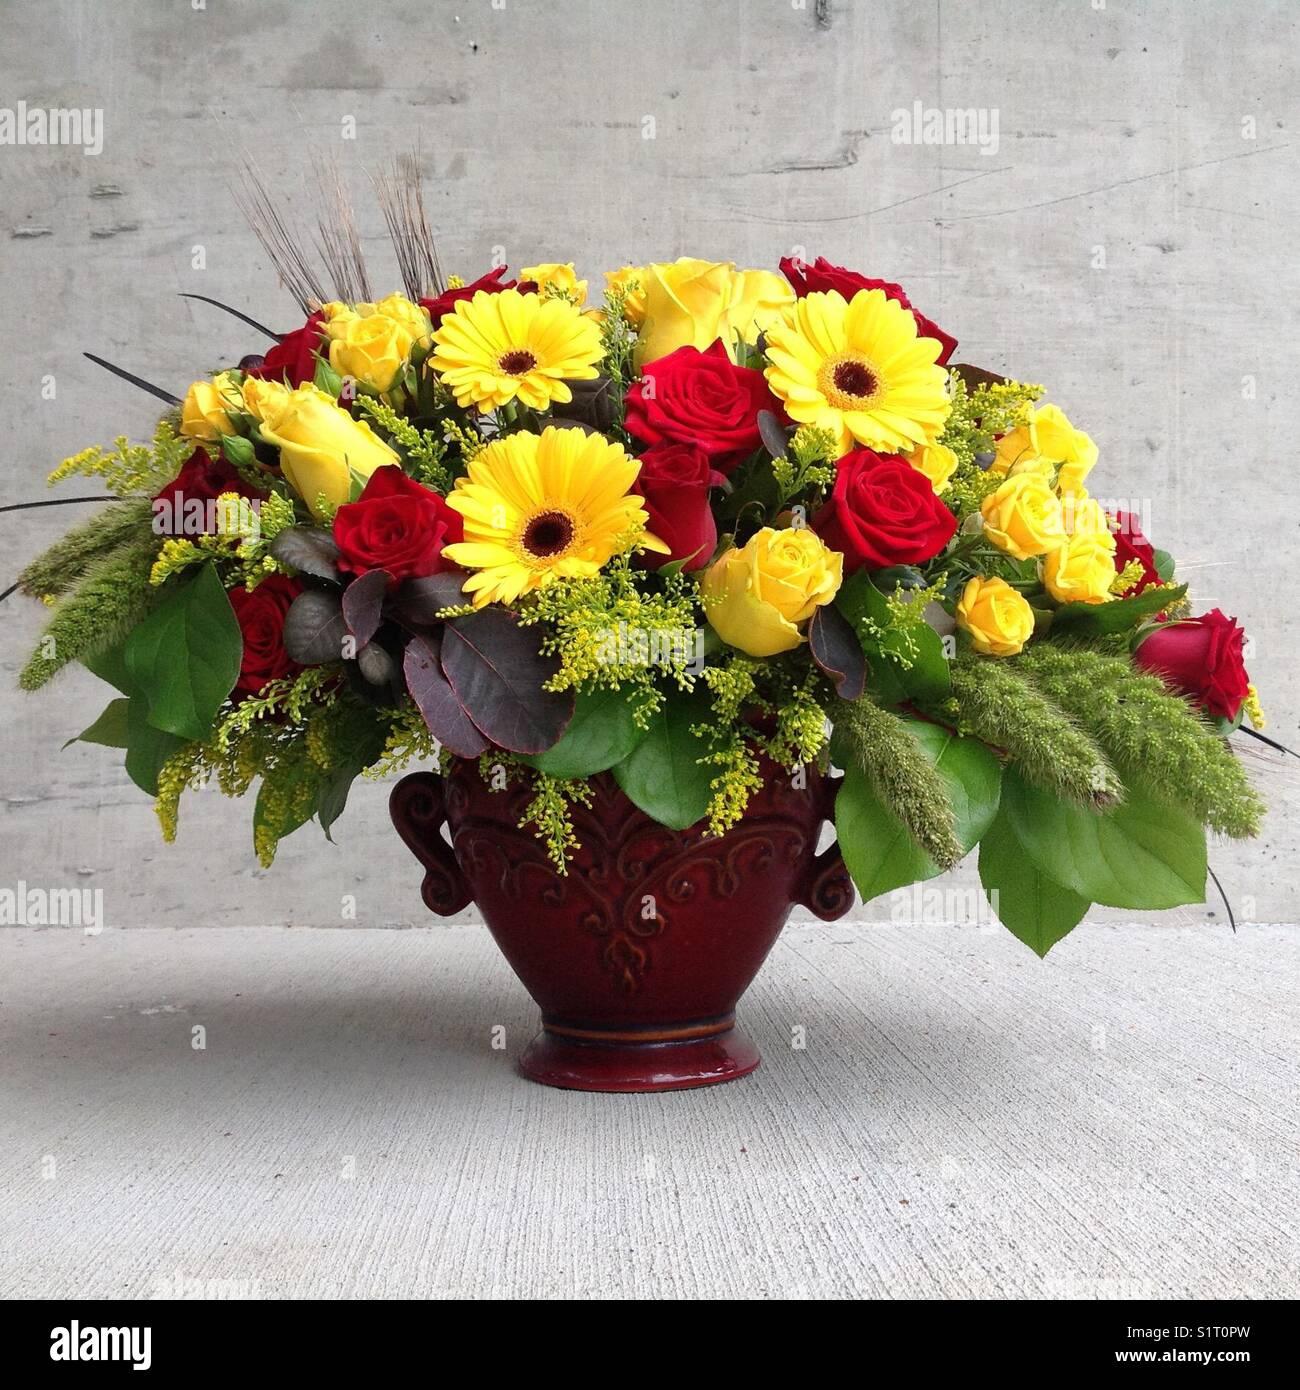 Red flower arrangement stock photos red flower arrangement stock red and yellow flower arrangement stock image mightylinksfo